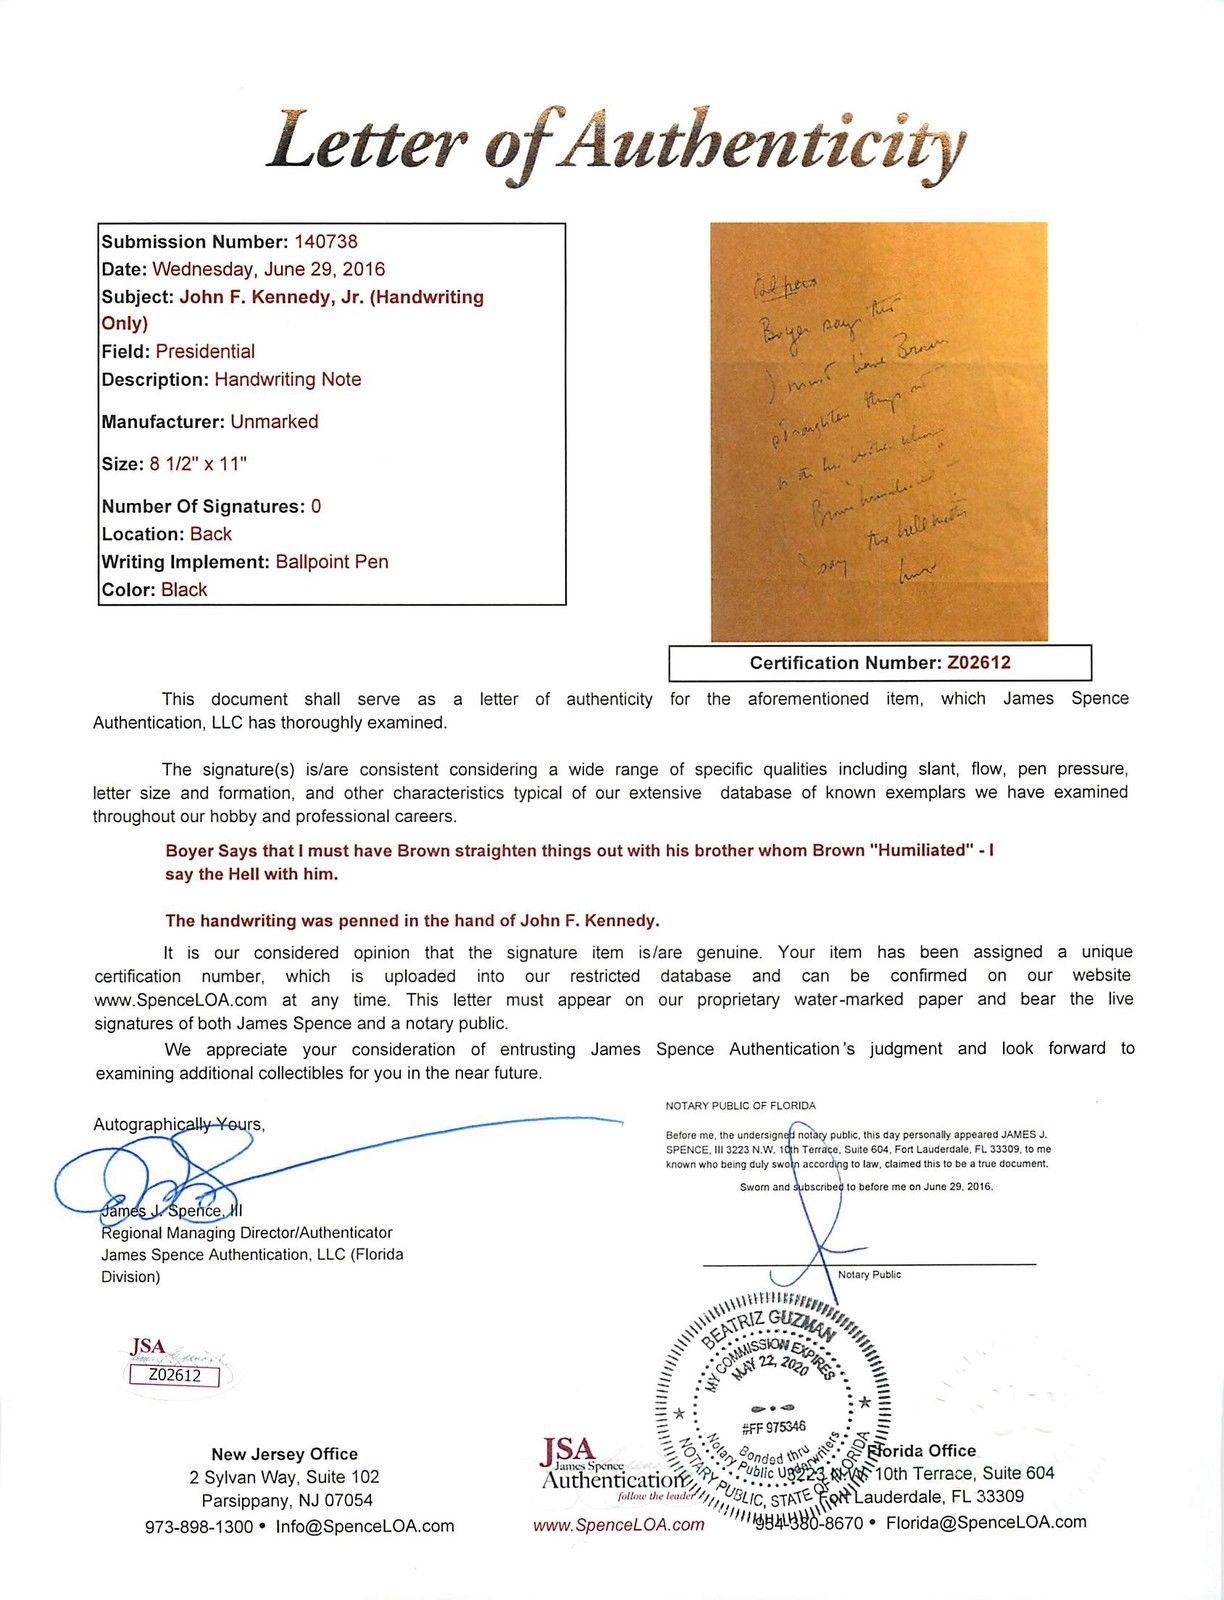 john-f-kennedy-authentic-handwriting-on-8-5x11-paper-as-senator-jsa-z02612-3